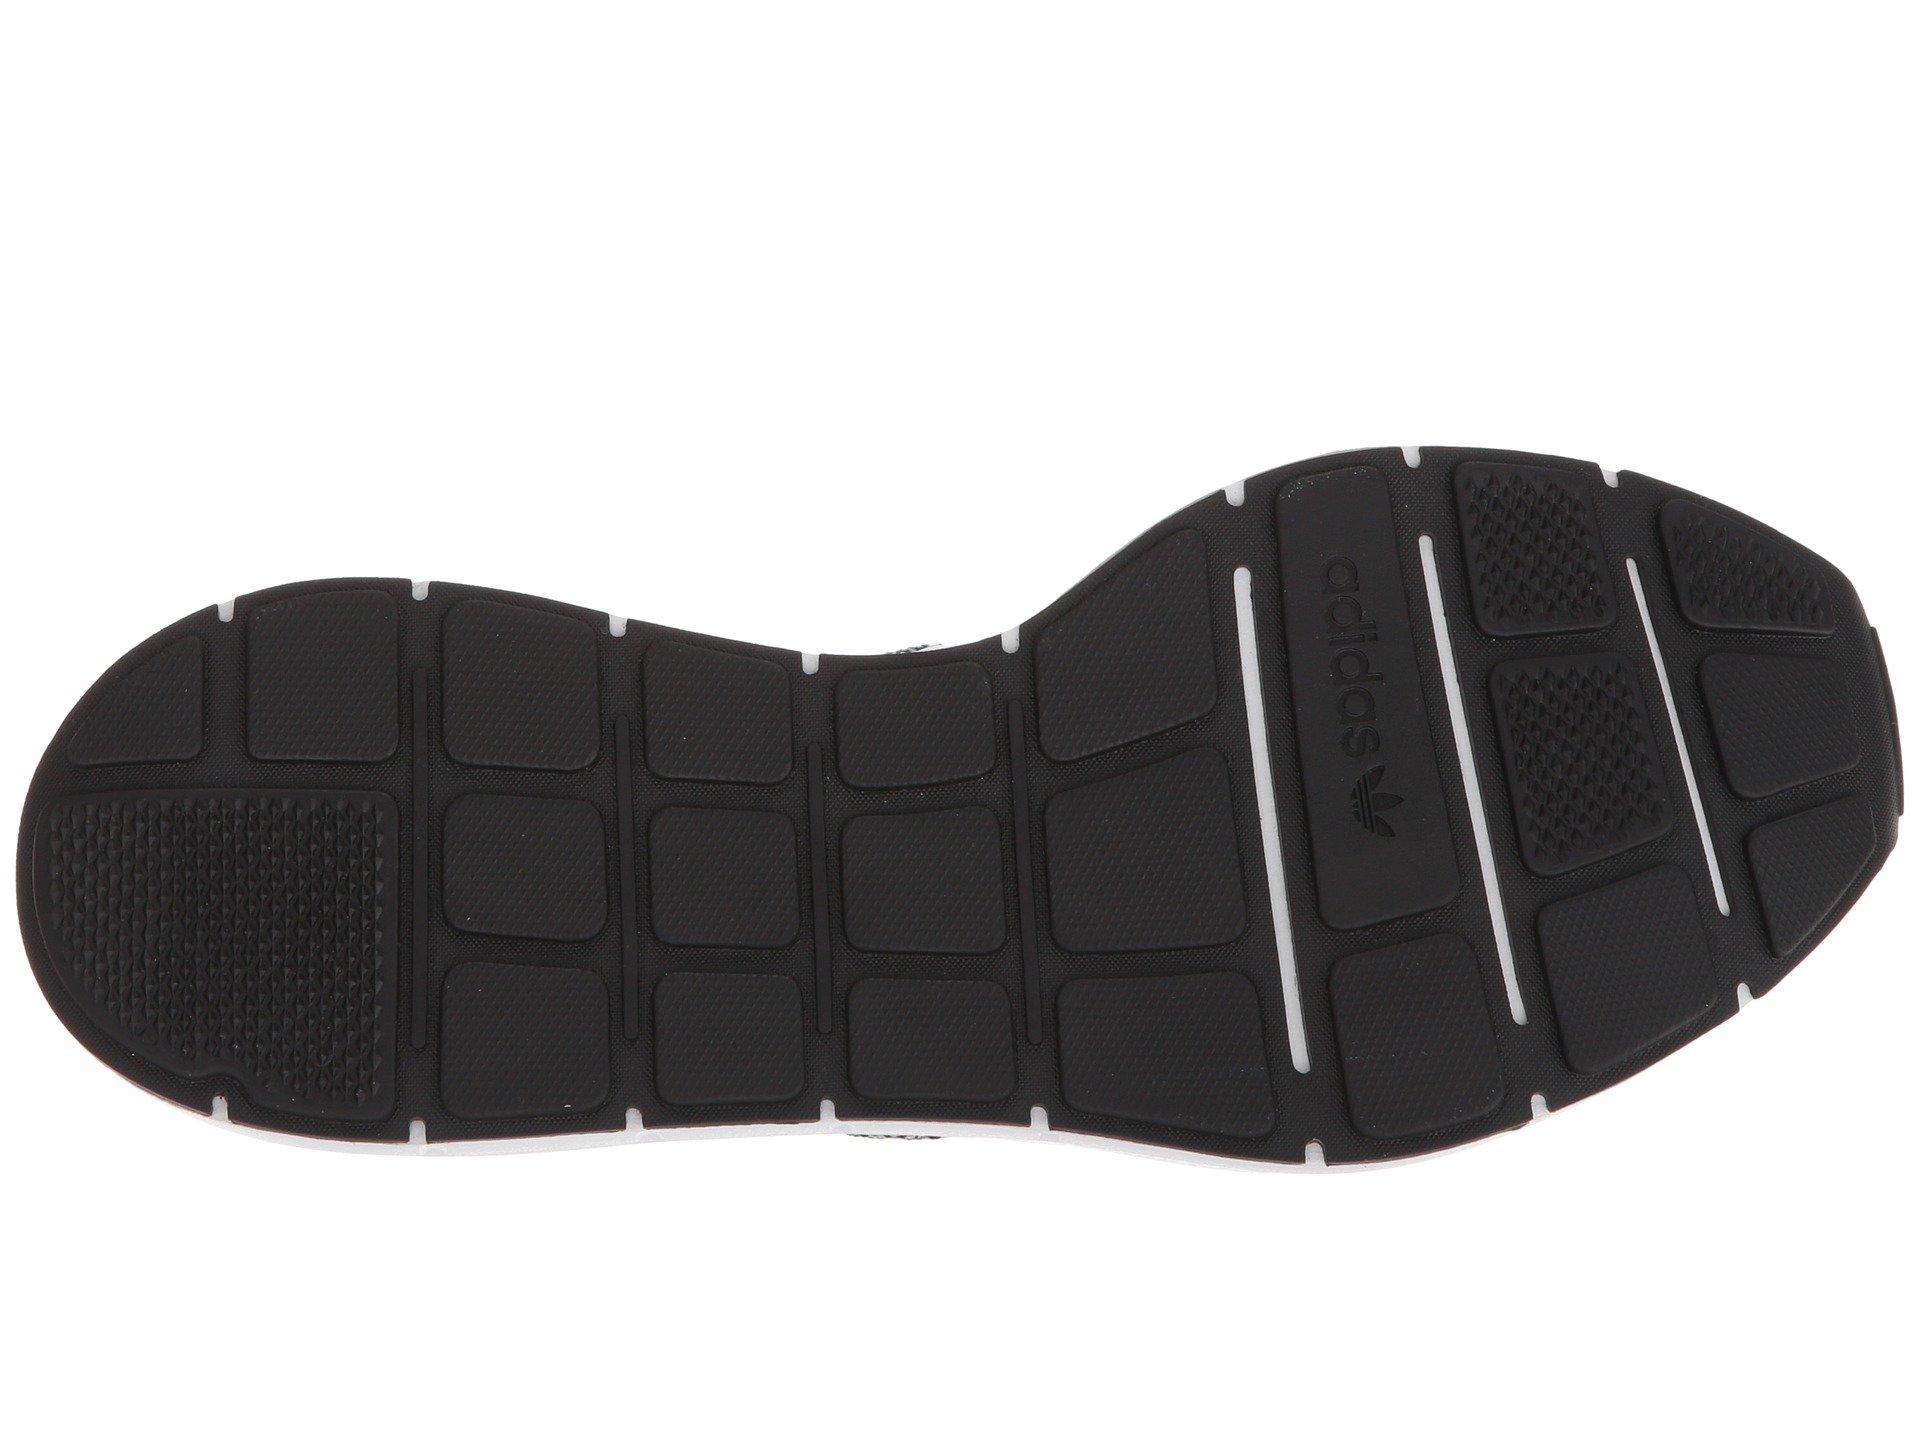 cd401dce5d7a4 Lyst - adidas Originals Swift Run (aero Blue S18 footwear White core ...